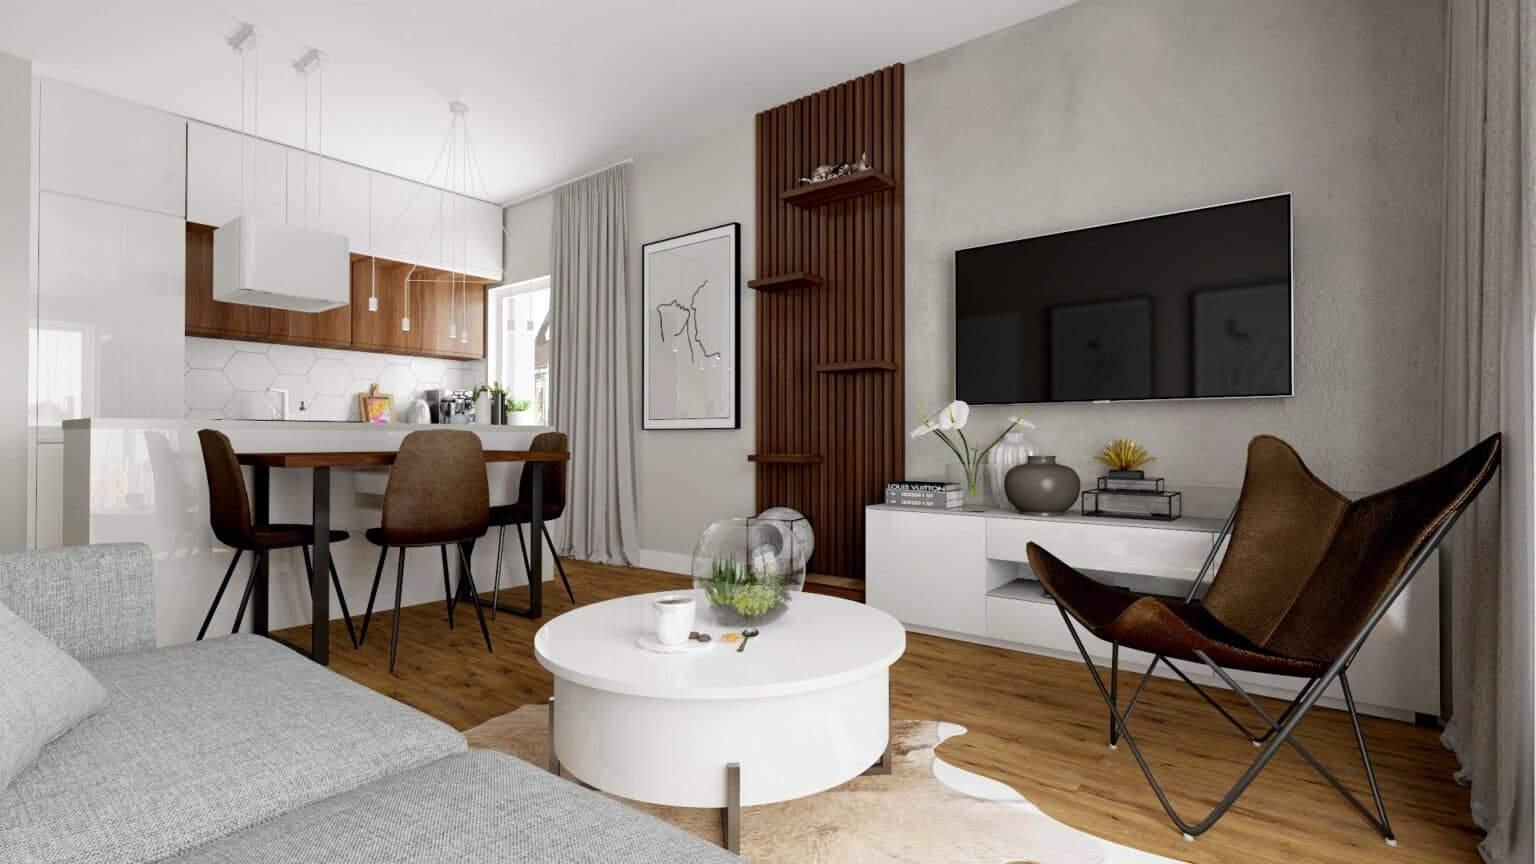 Duszynska Design Apartament Mosty 4 1